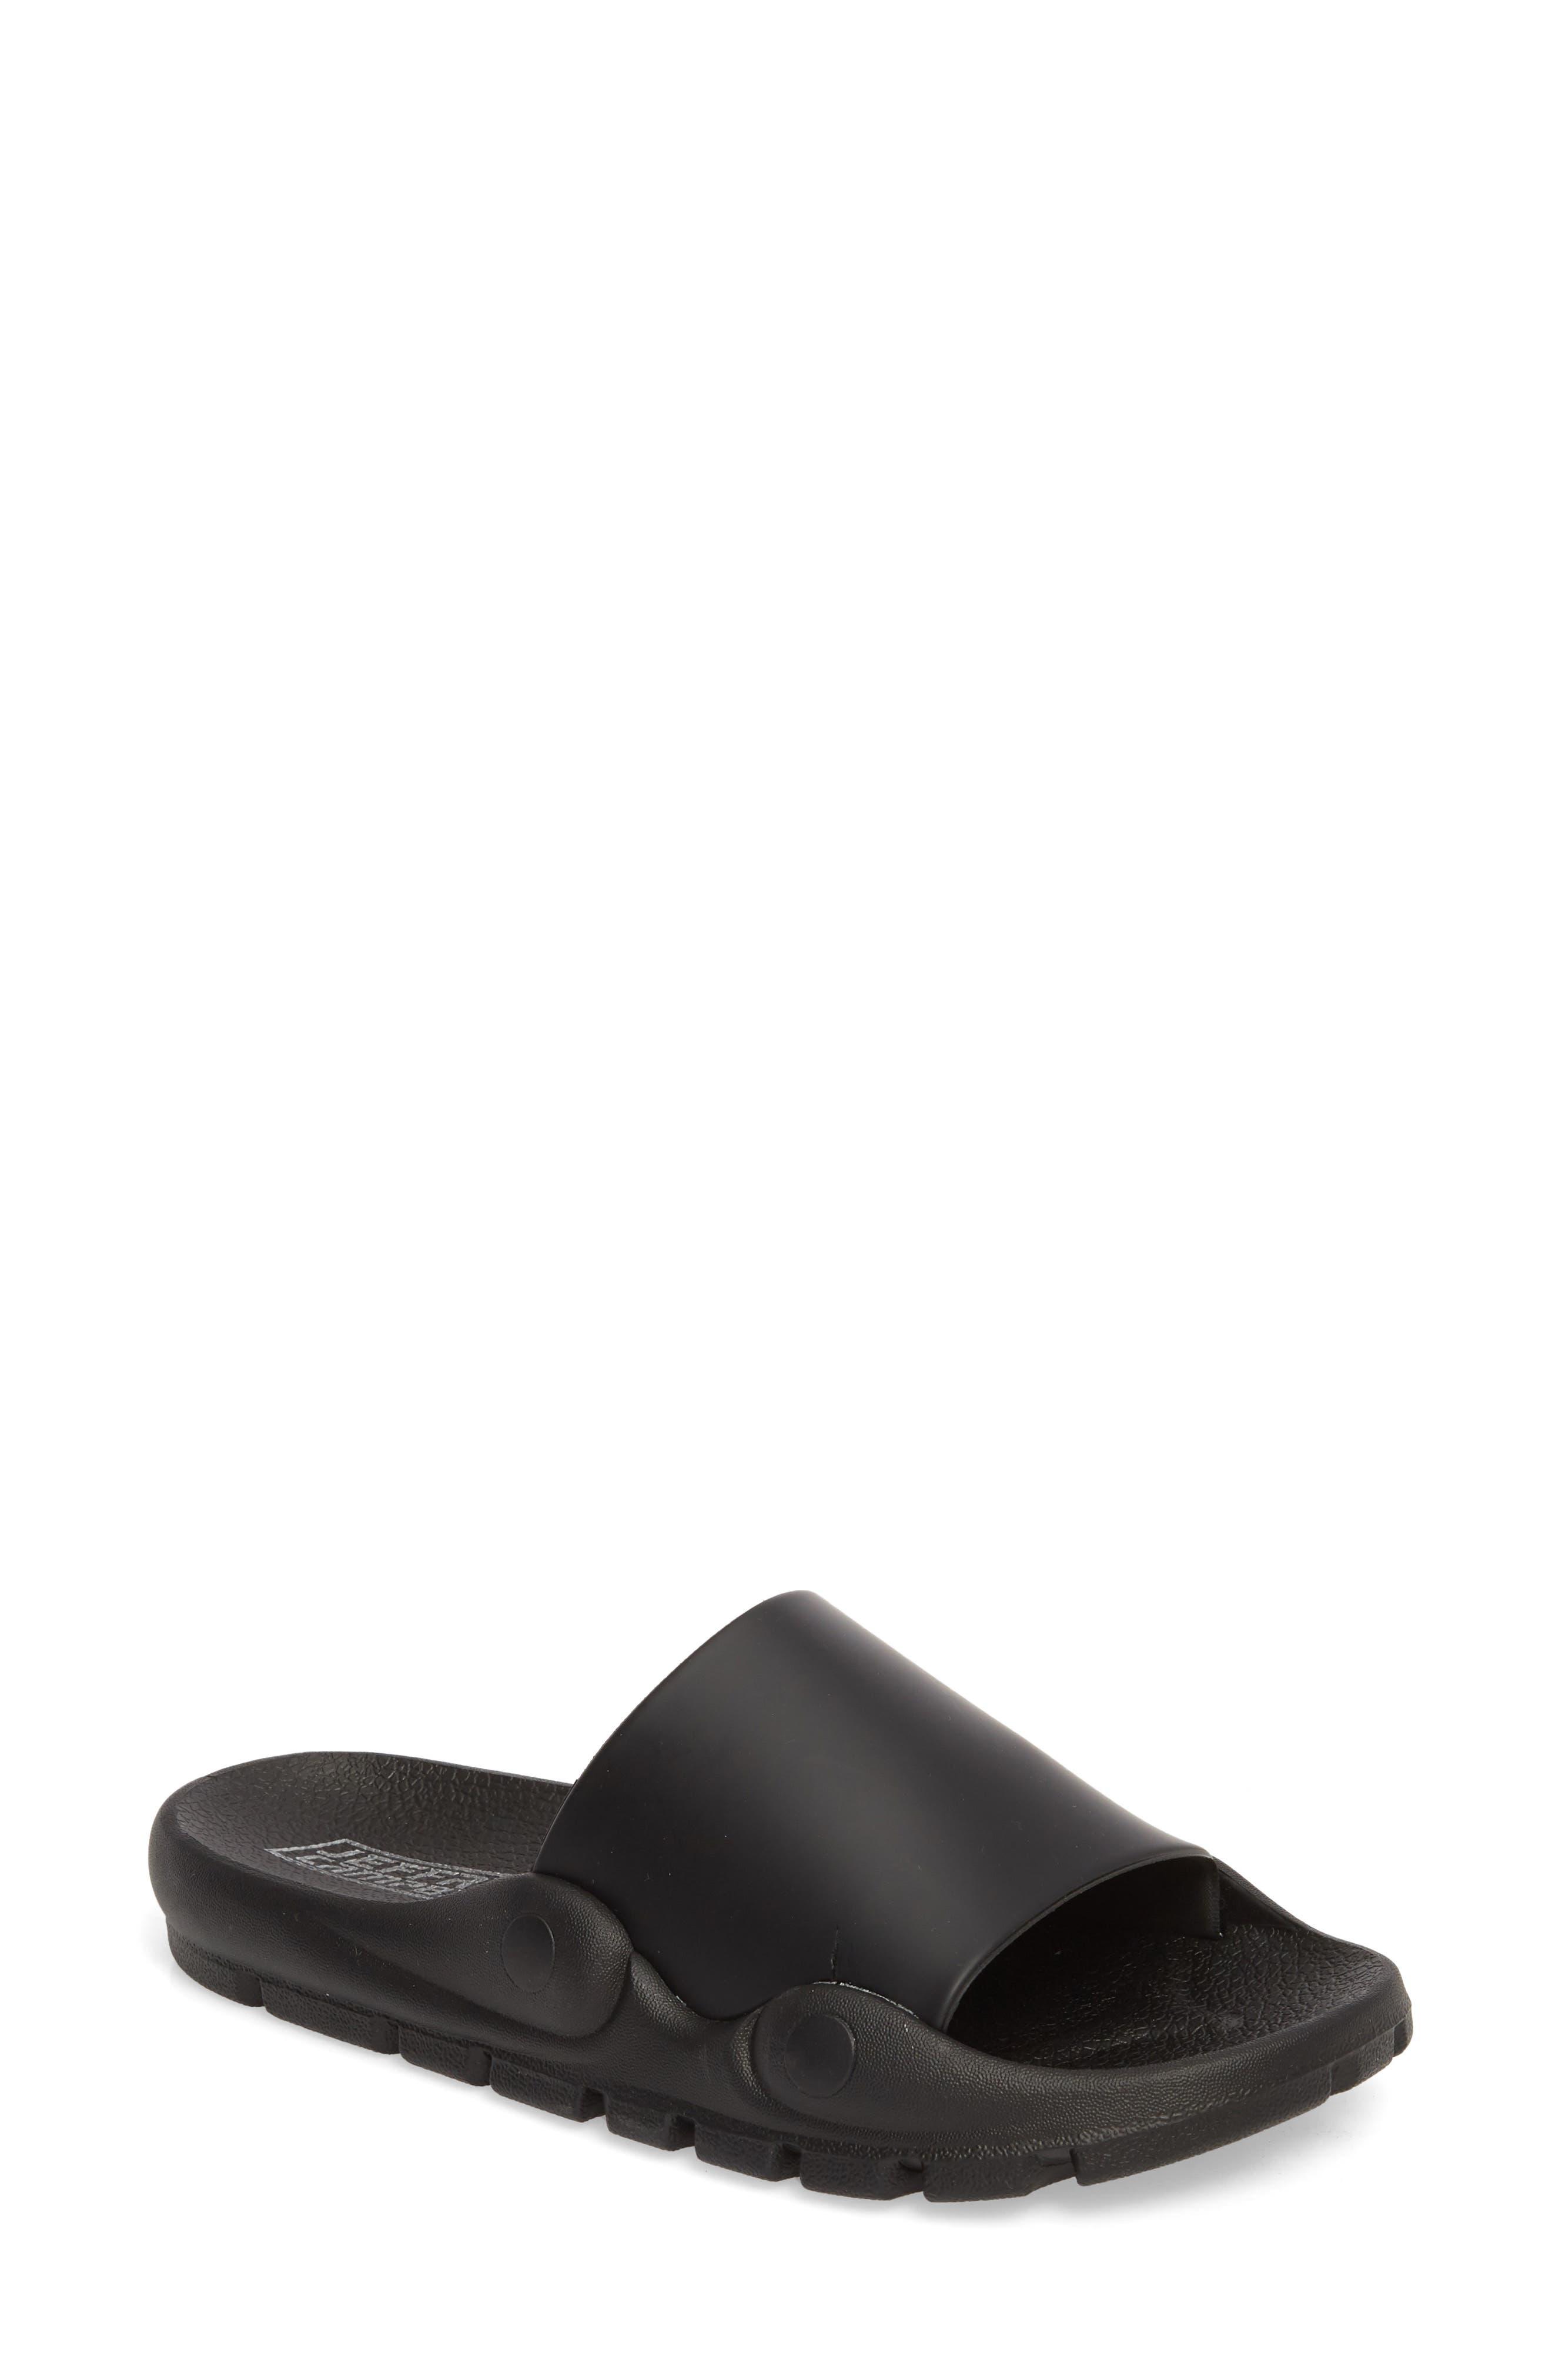 Aspic Sandal,                         Main,                         color, 007